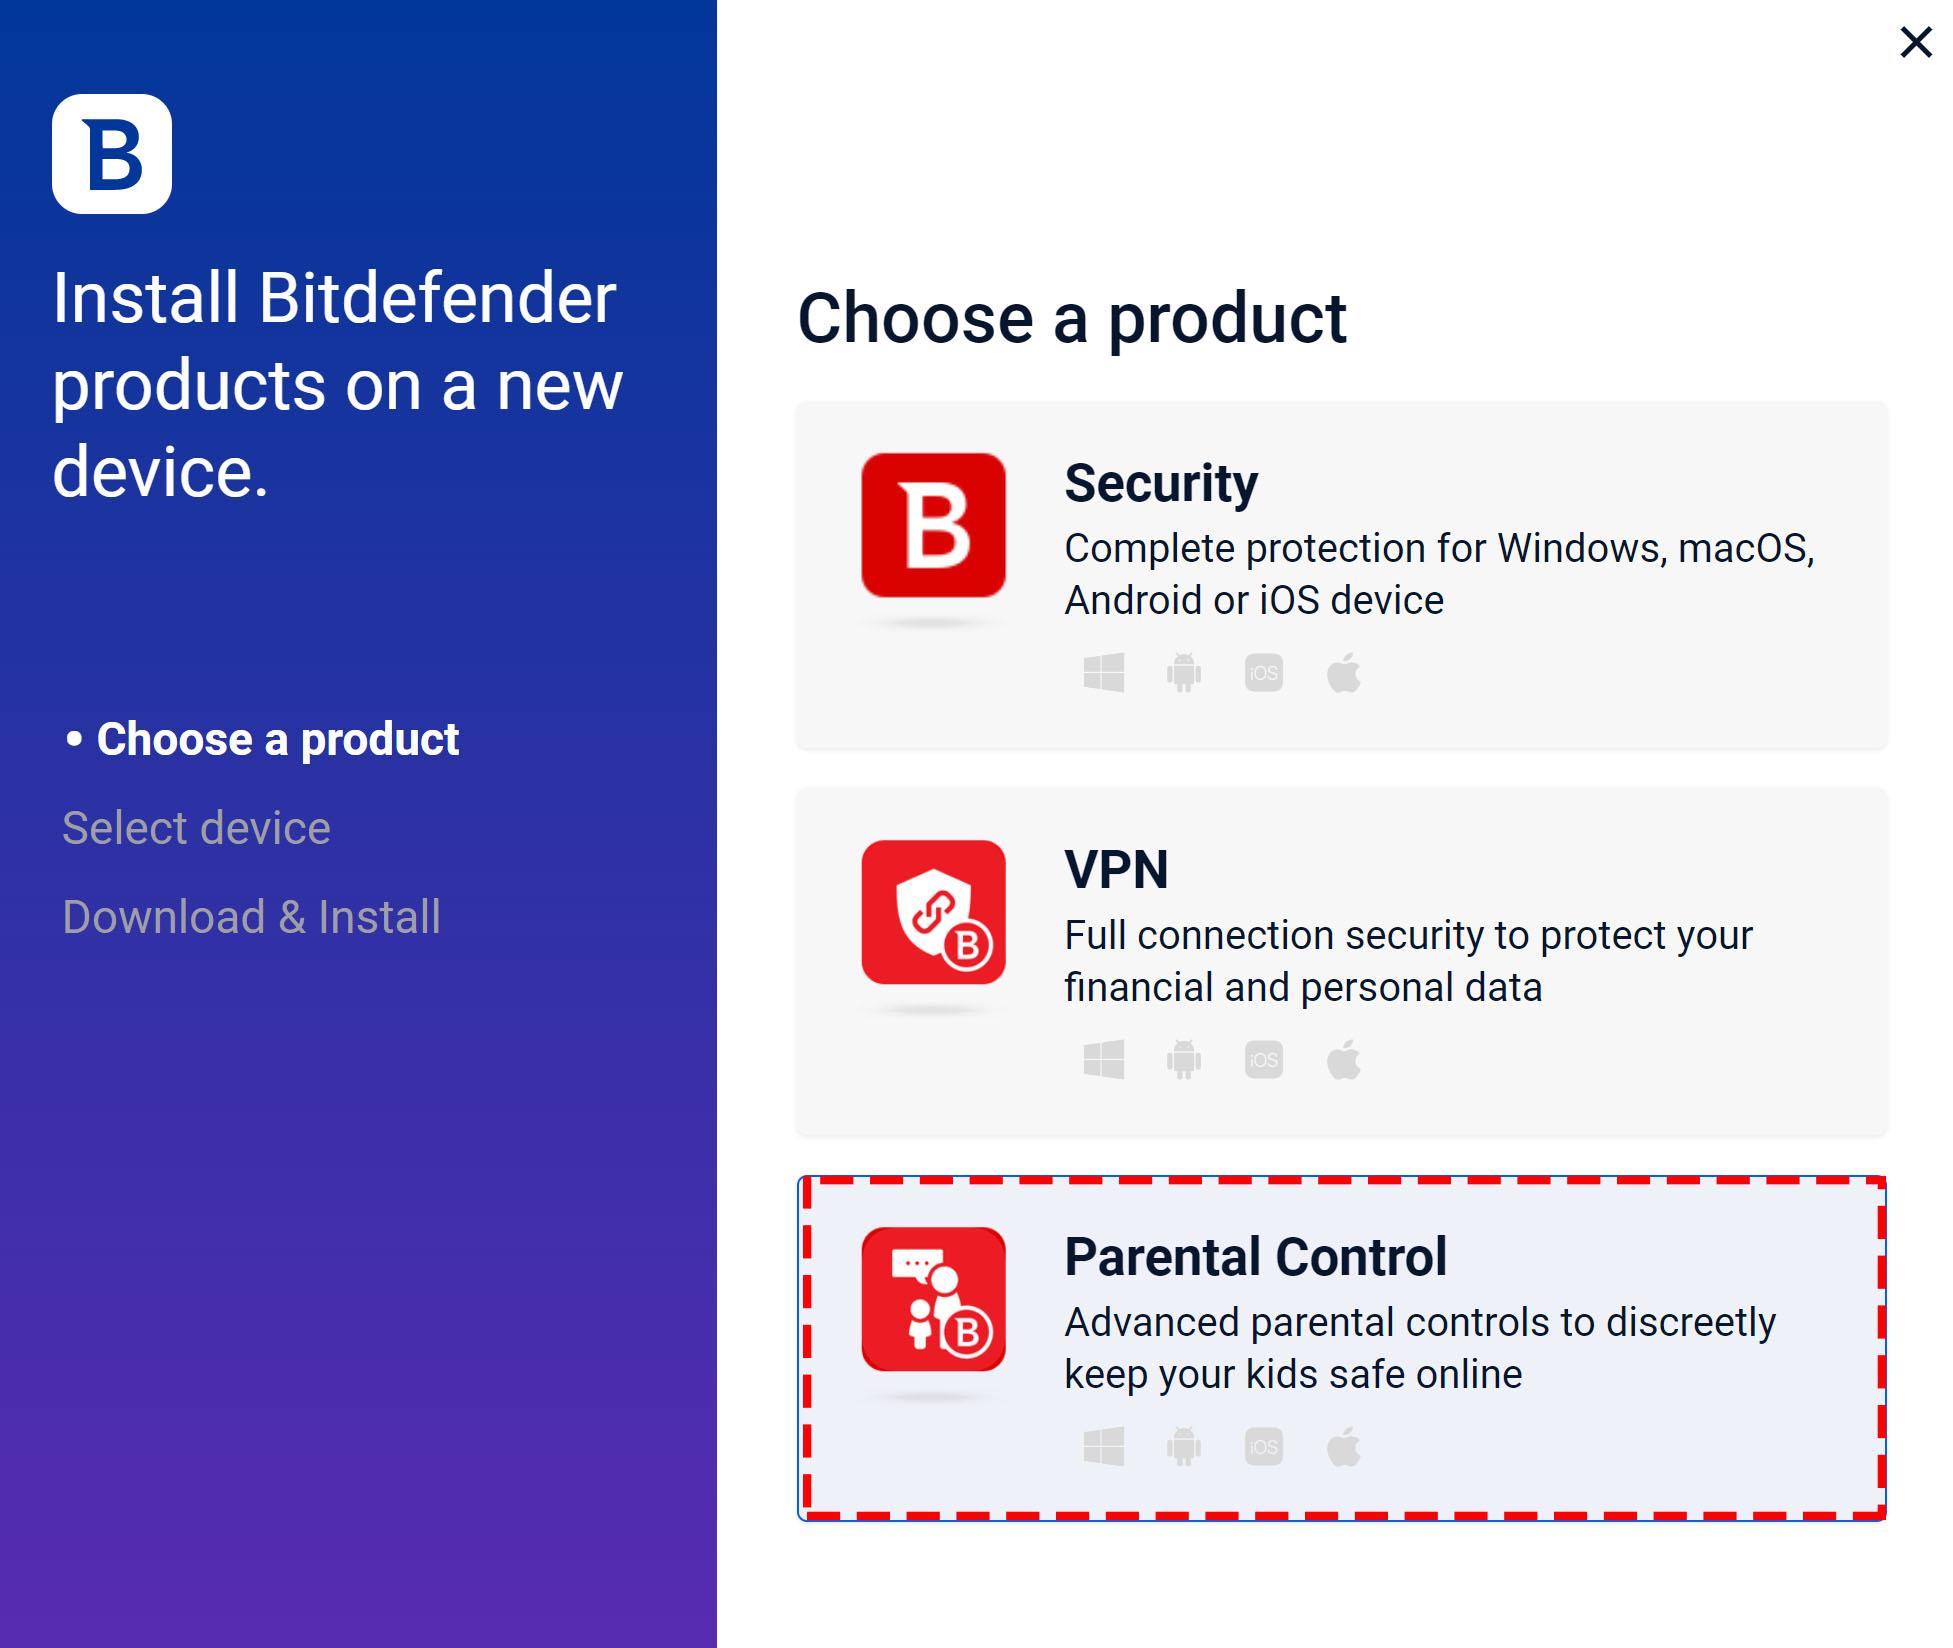 Bitdefender Parental Control on Windows - Choose